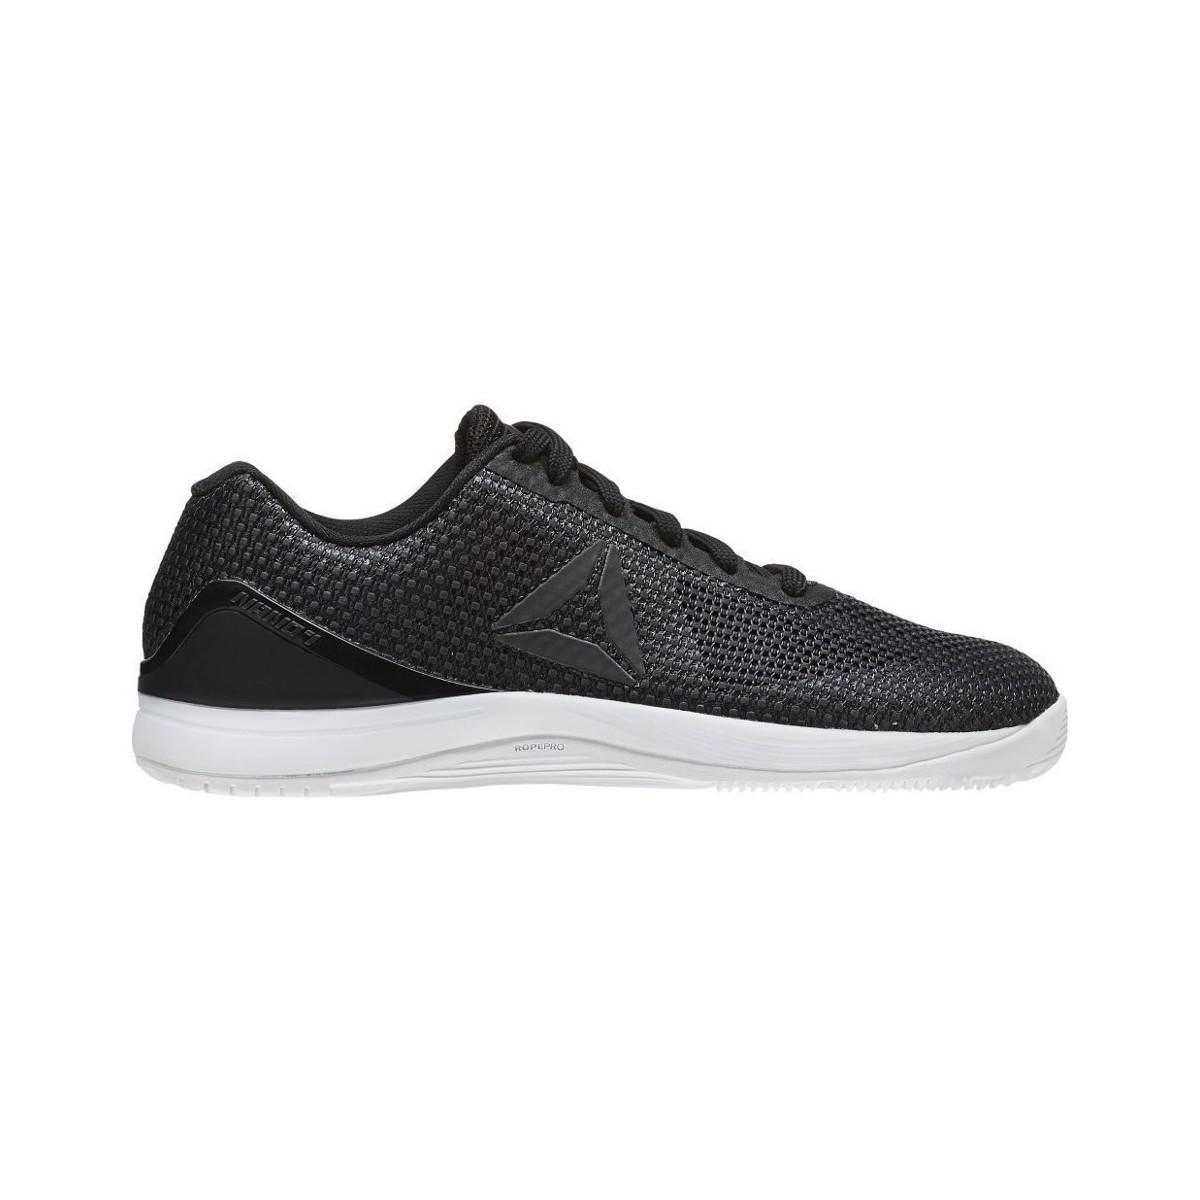 Lyst - Reebok Crossfit Nano 70 Blackleadwhite Women s Shoes ... fa6c3ef50